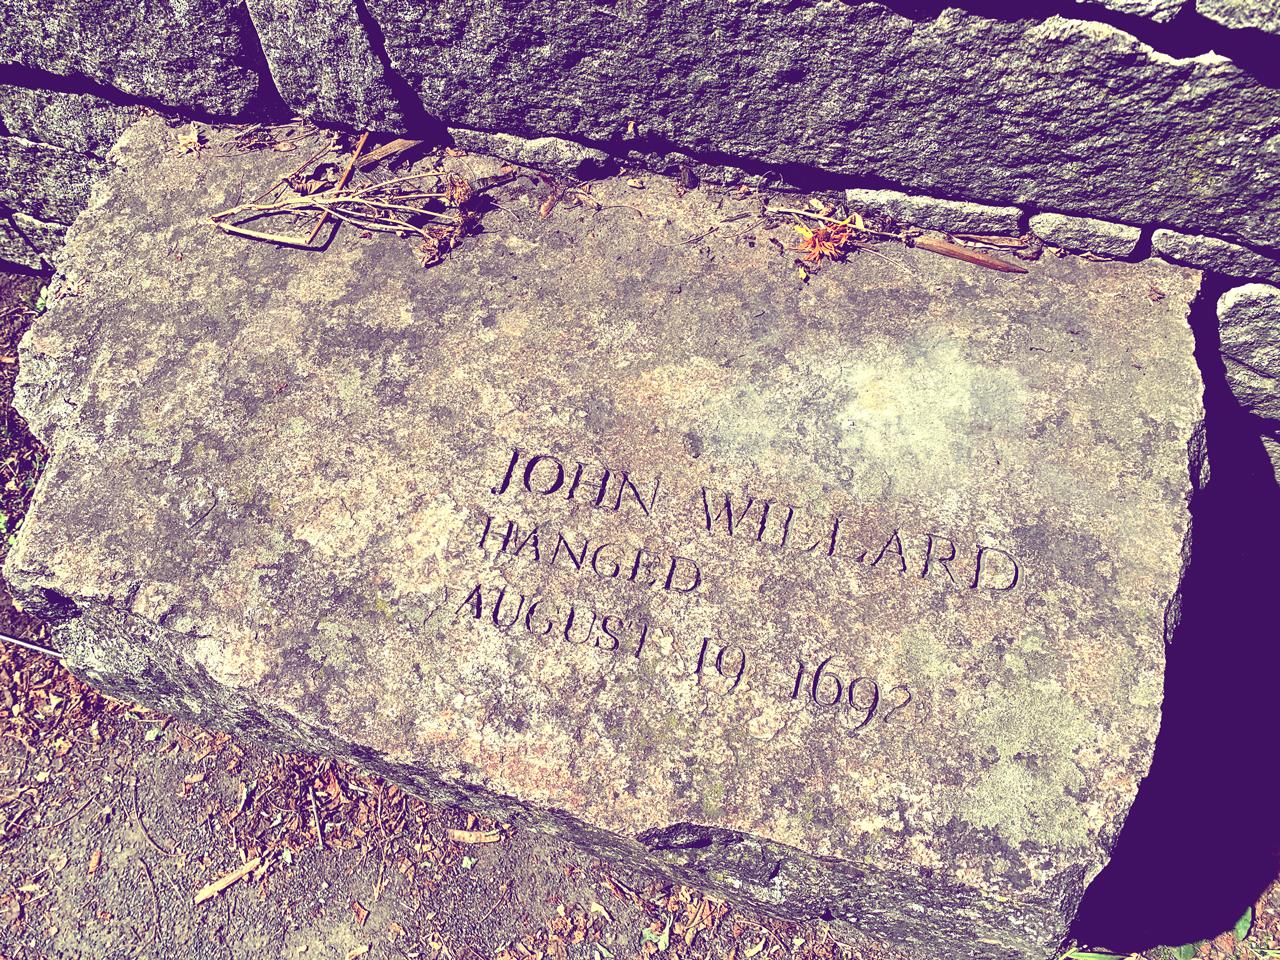 salem-witch-trials-memorial-massachusetts-john-willard-1280x960